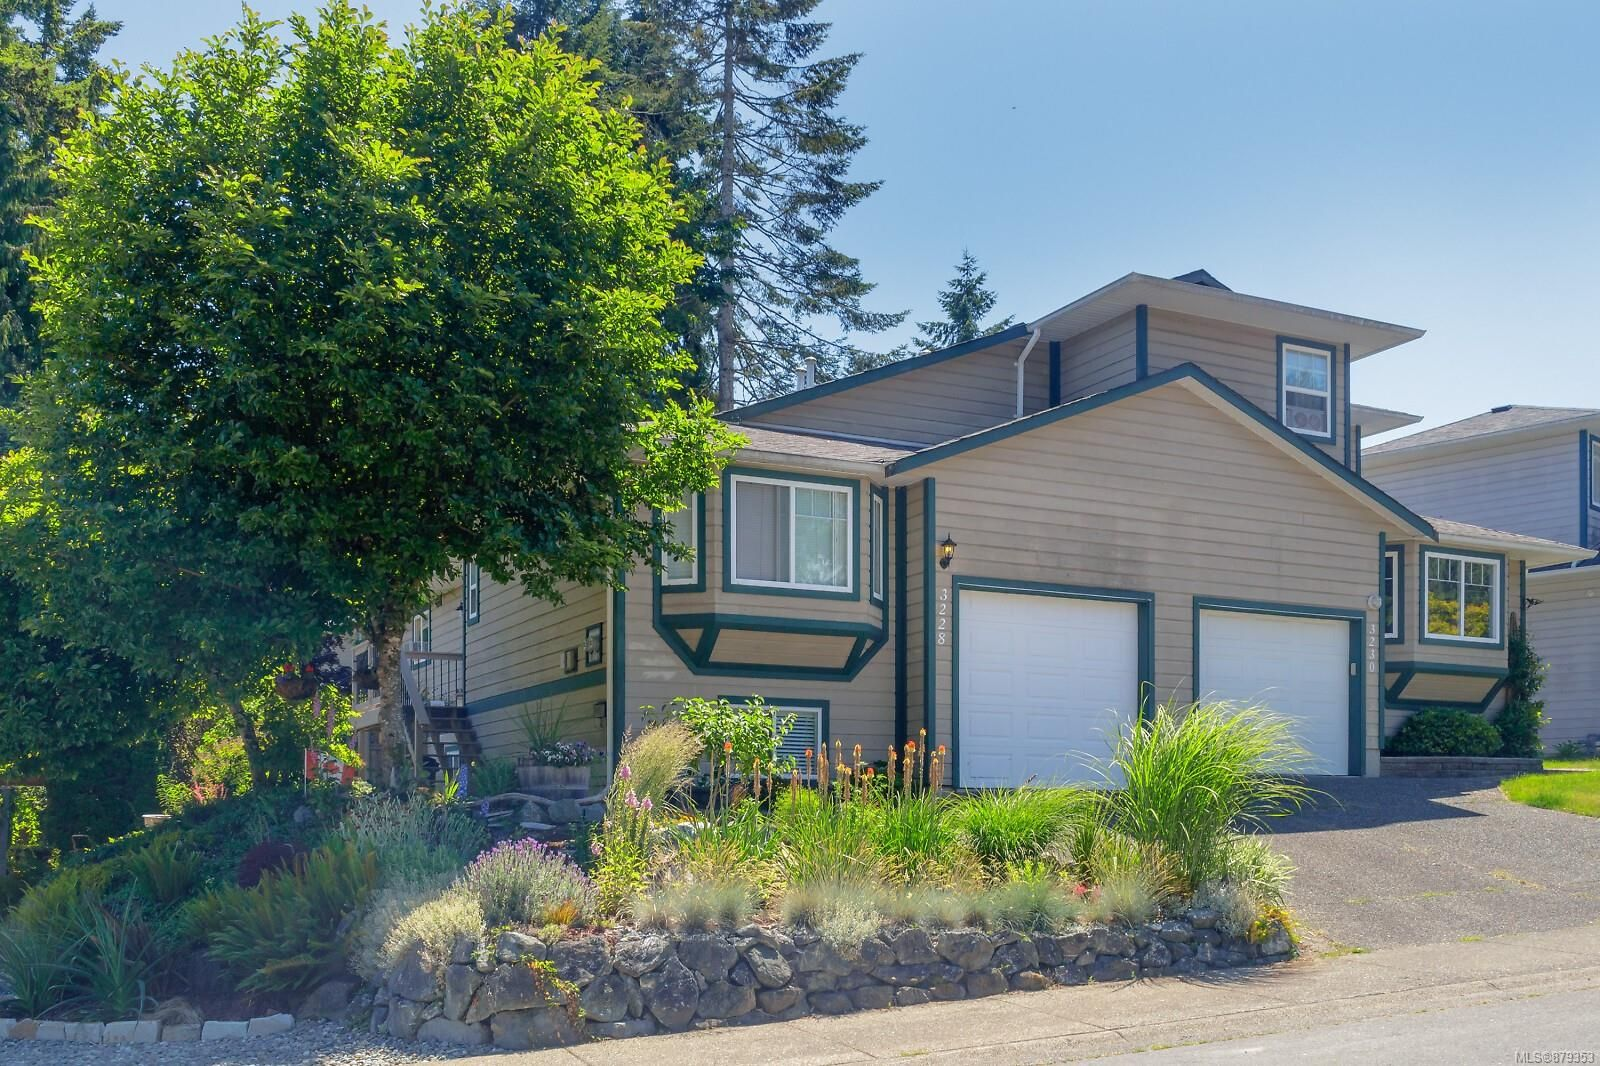 Main Photo: 3228 Hillwood Rd in : Du West Duncan Half Duplex for sale (Duncan)  : MLS®# 879353